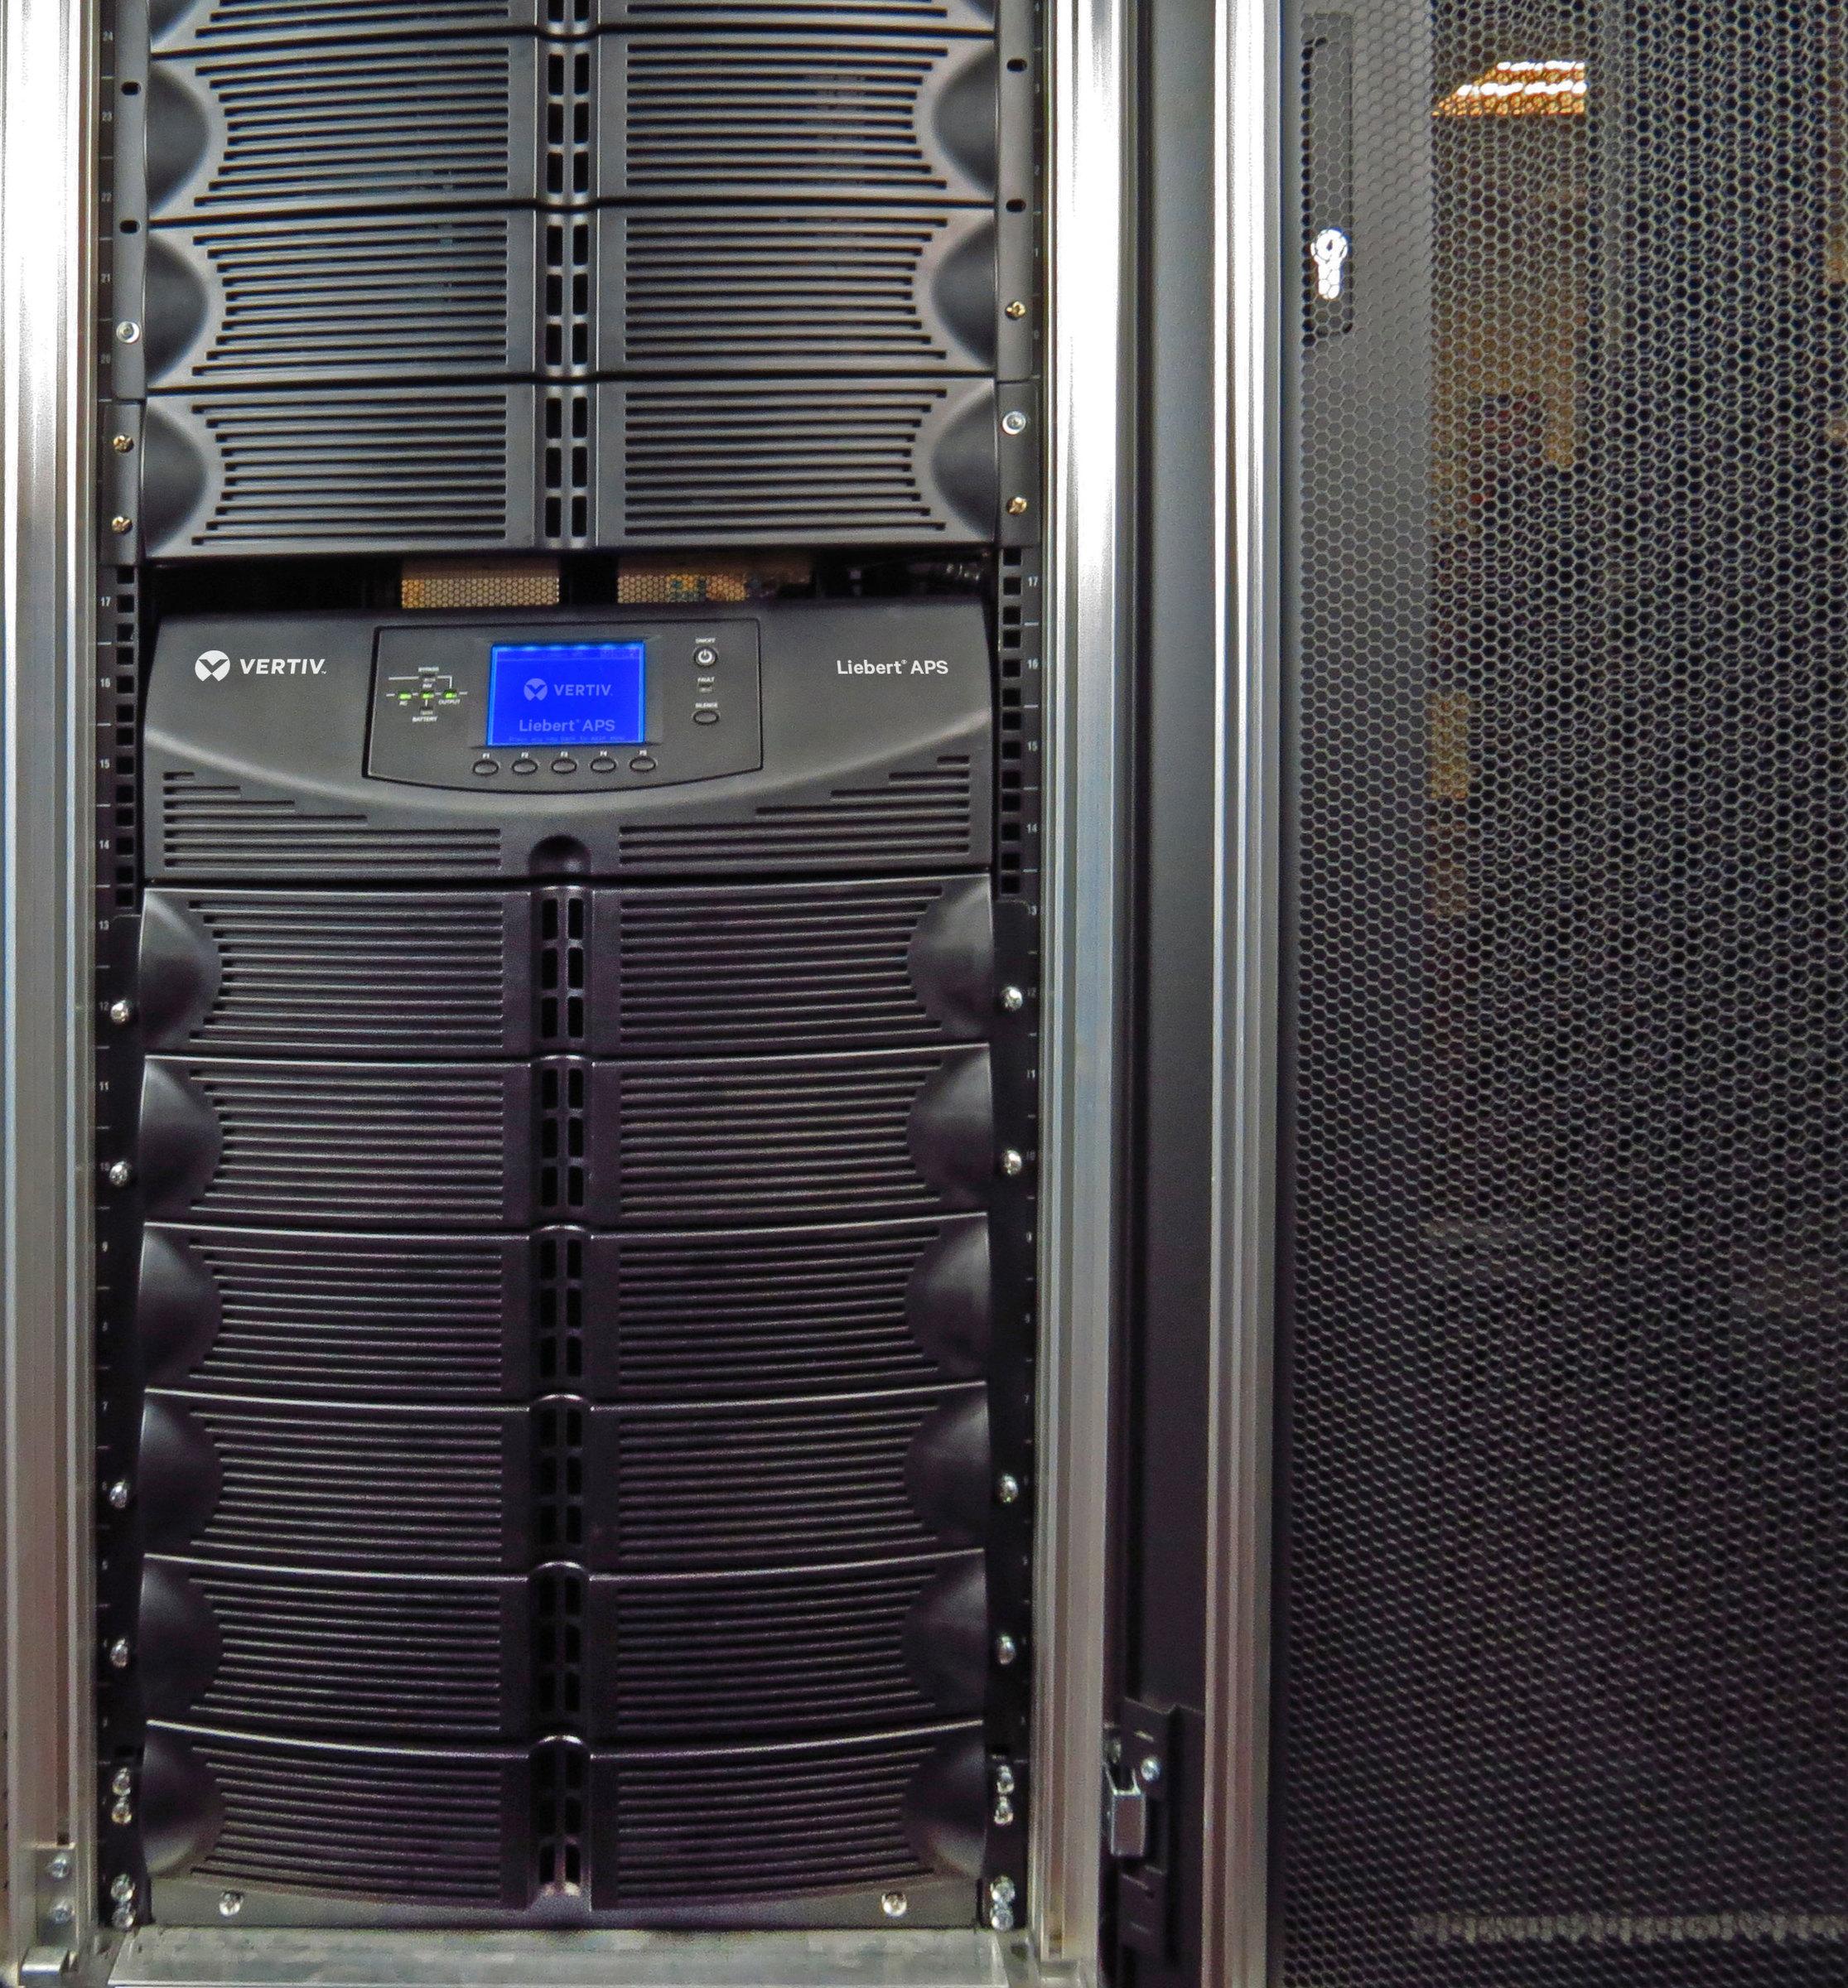 Vertiv Liebert APS | Electronic Support Systems